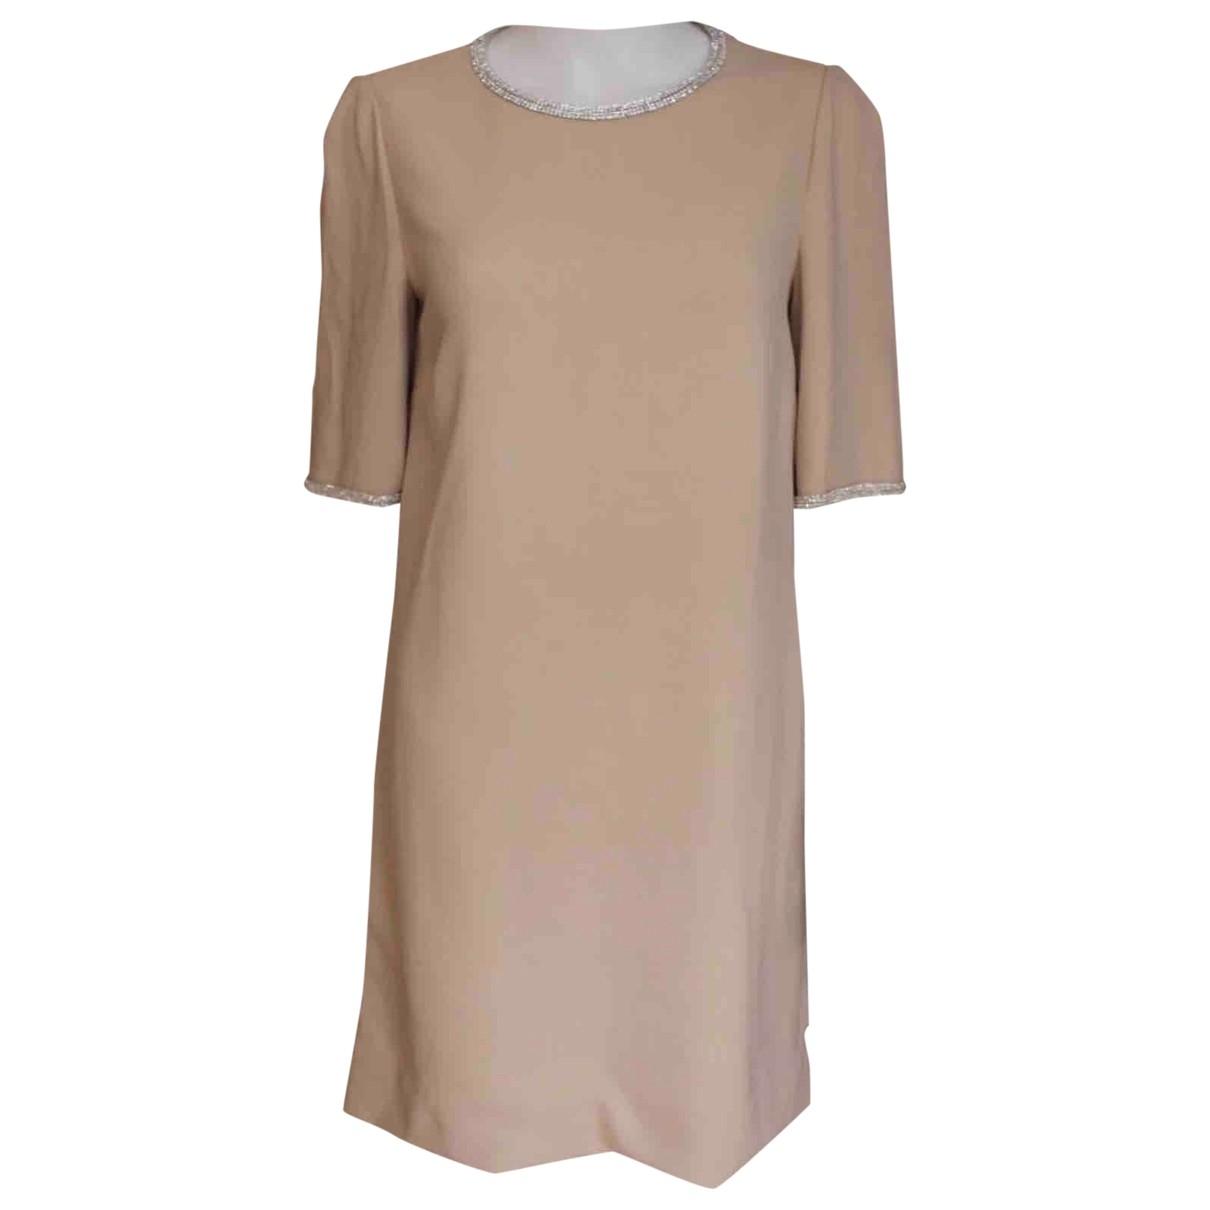 Dolce & Gabbana \N Kleid in  Beige Viskose